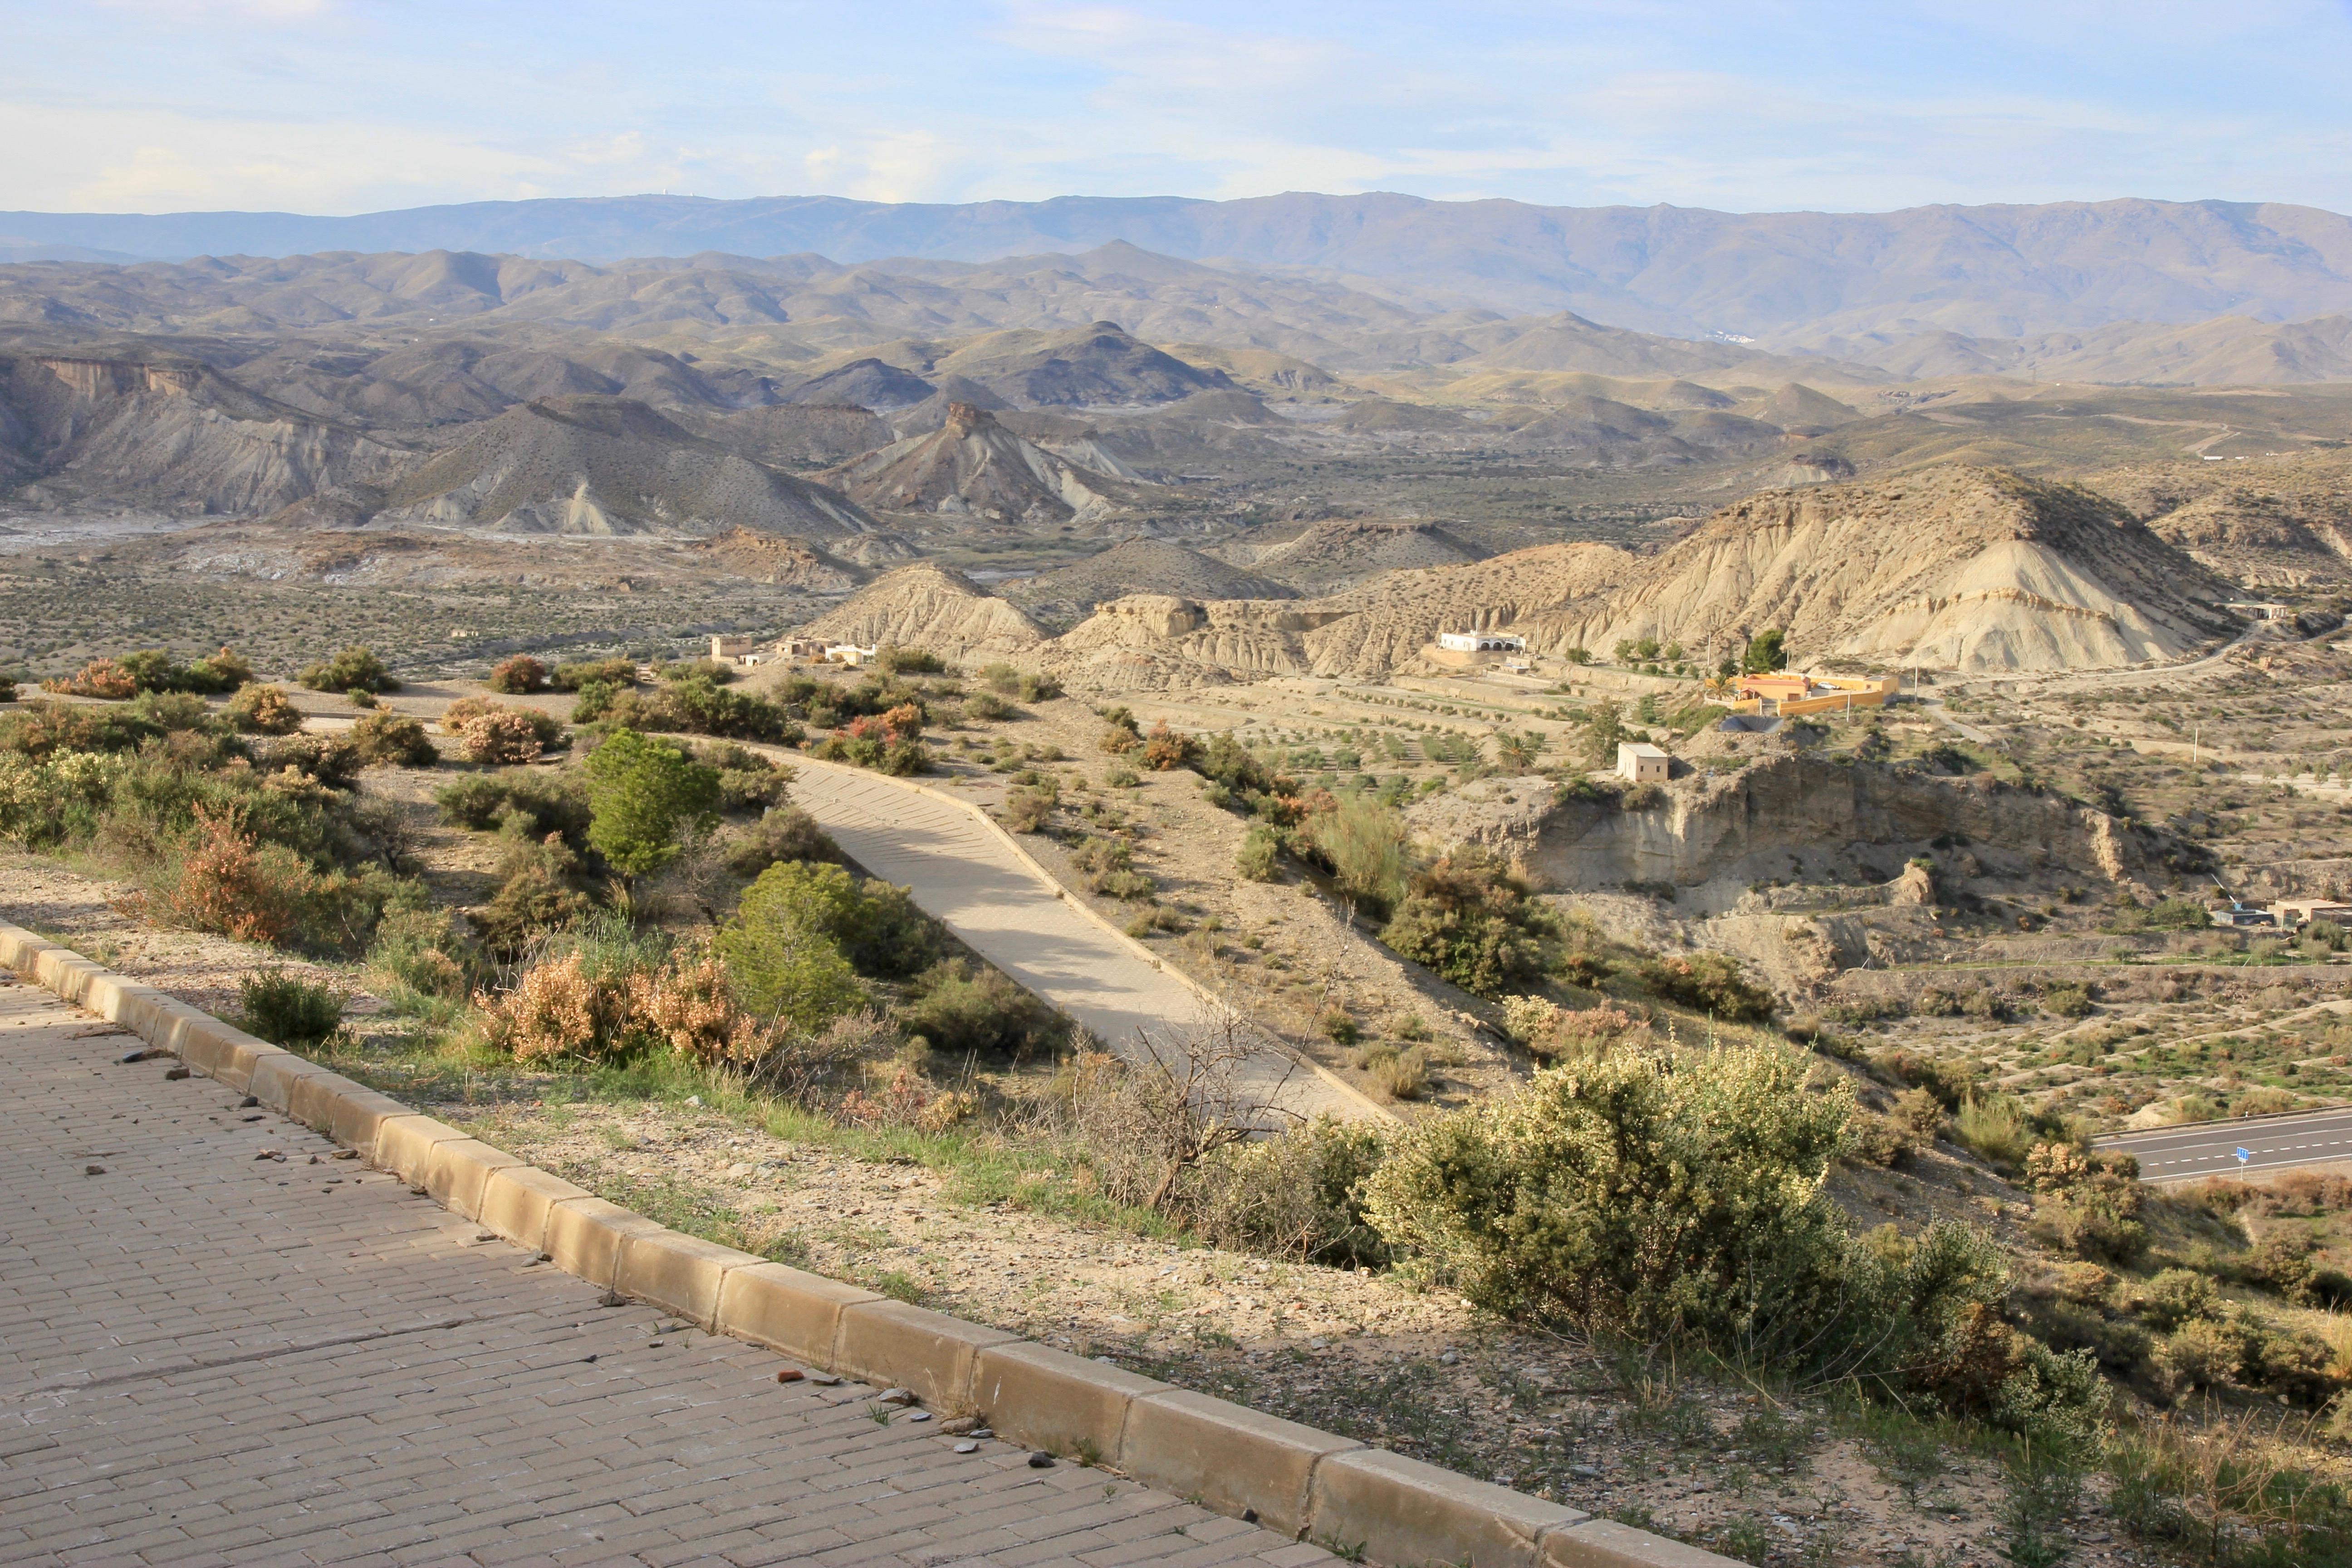 Desierto de Tabernas, Spagna